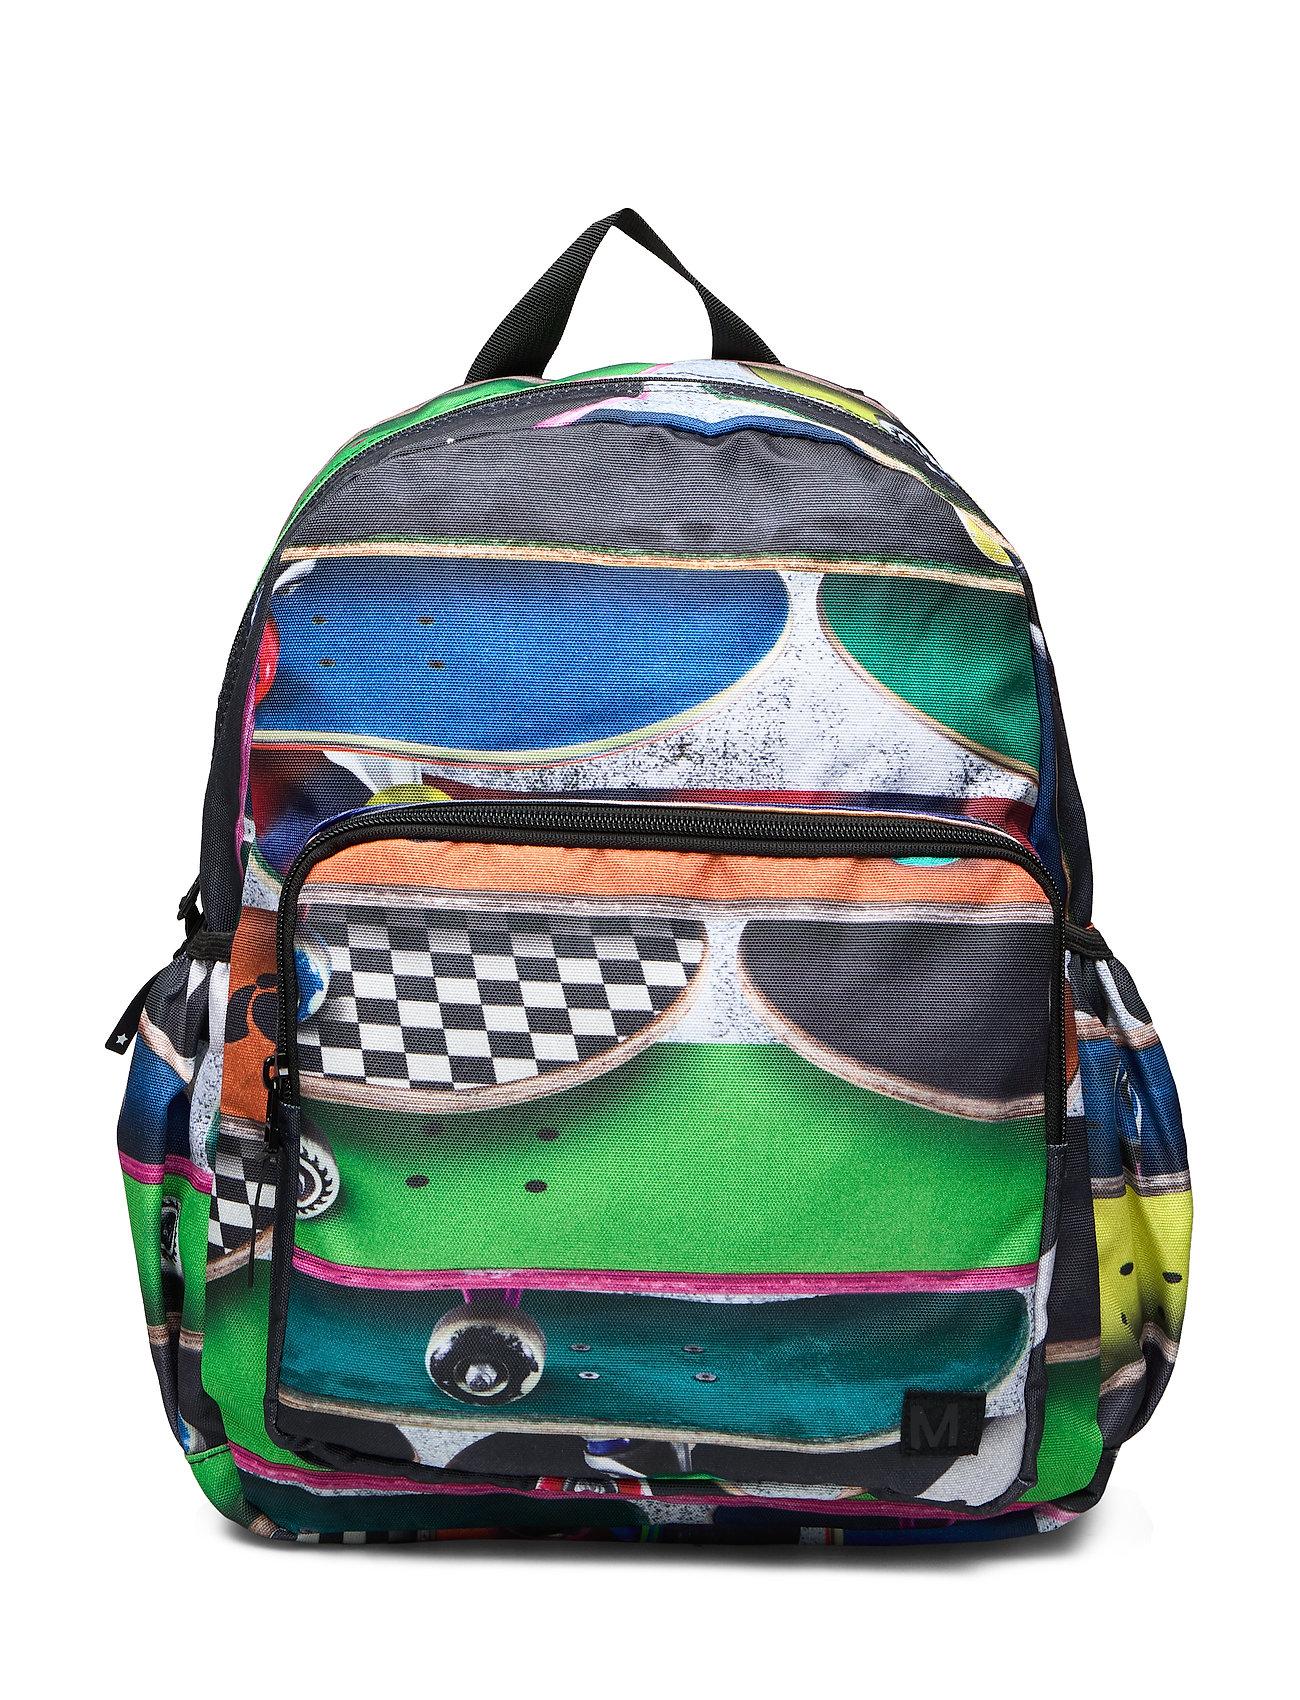 molo Big Backpack - SKATEBOARDS